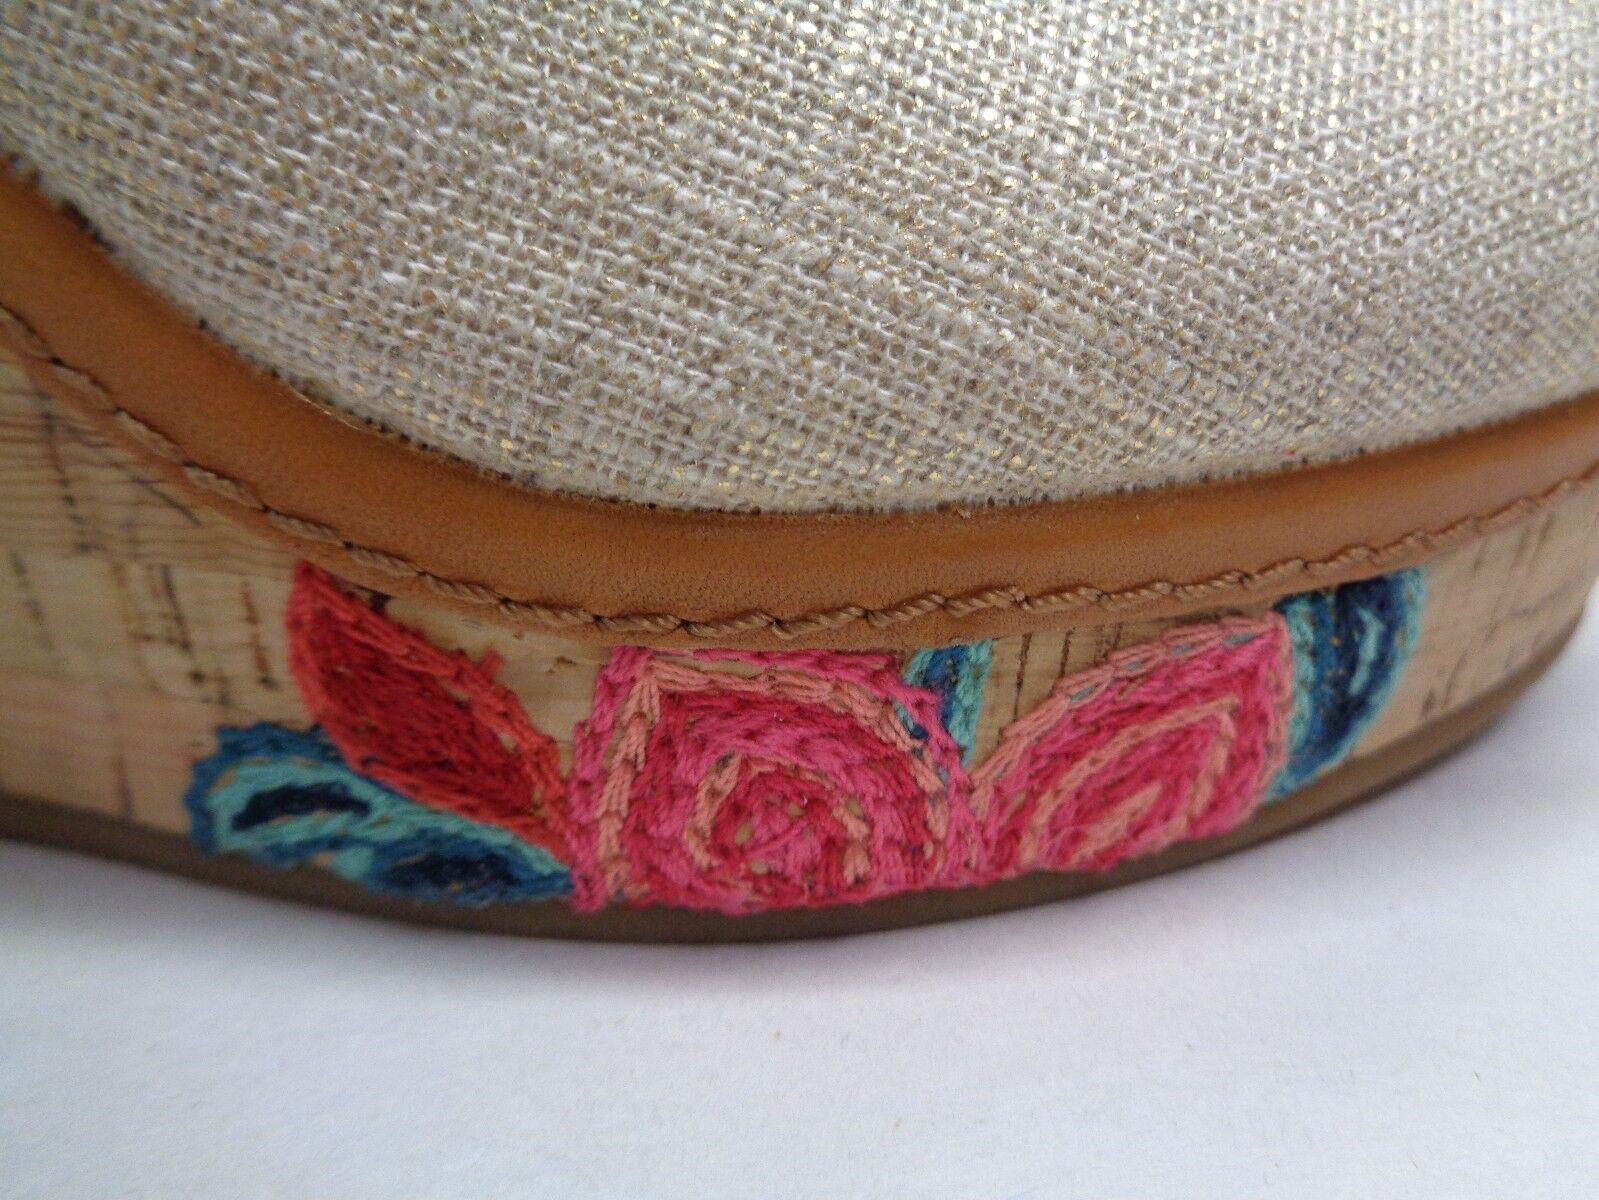 Antonio Melani Größe 8 M ALLIS Floral Braun Fabric Fabric Fabric Wedge Heels New Damenschuhe Schuhes 480bcf